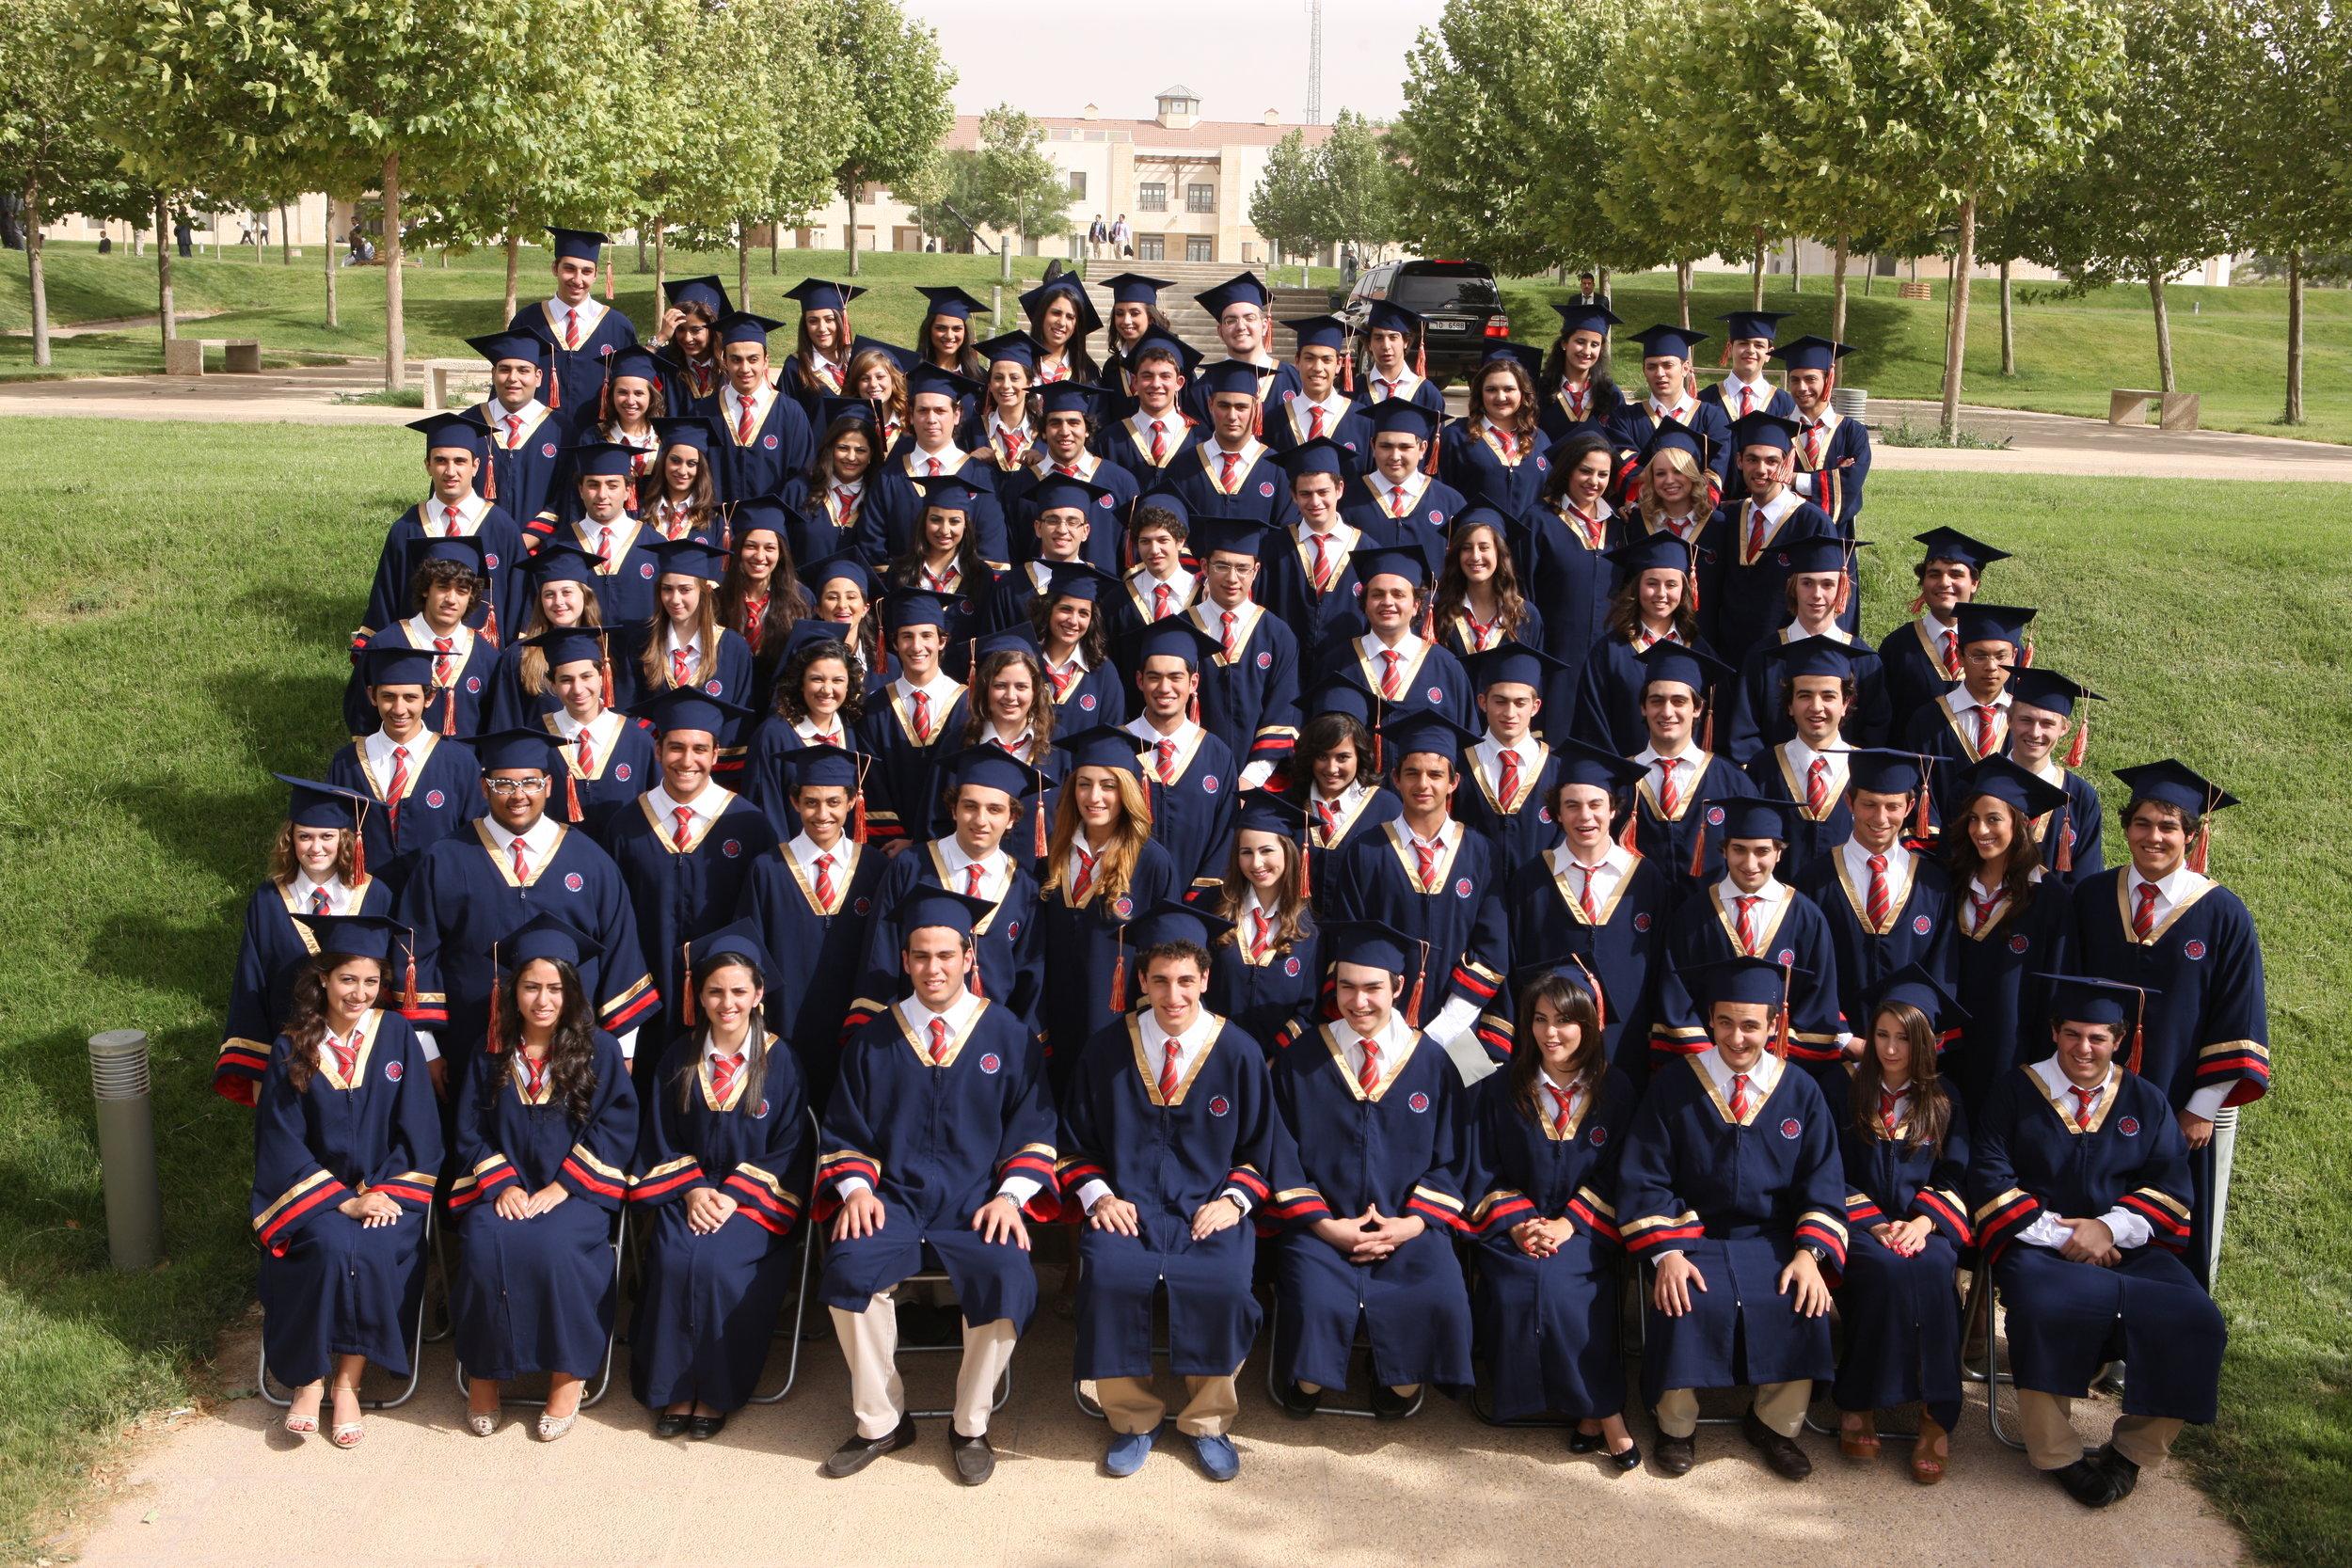 King's Academy's First Graduating Class